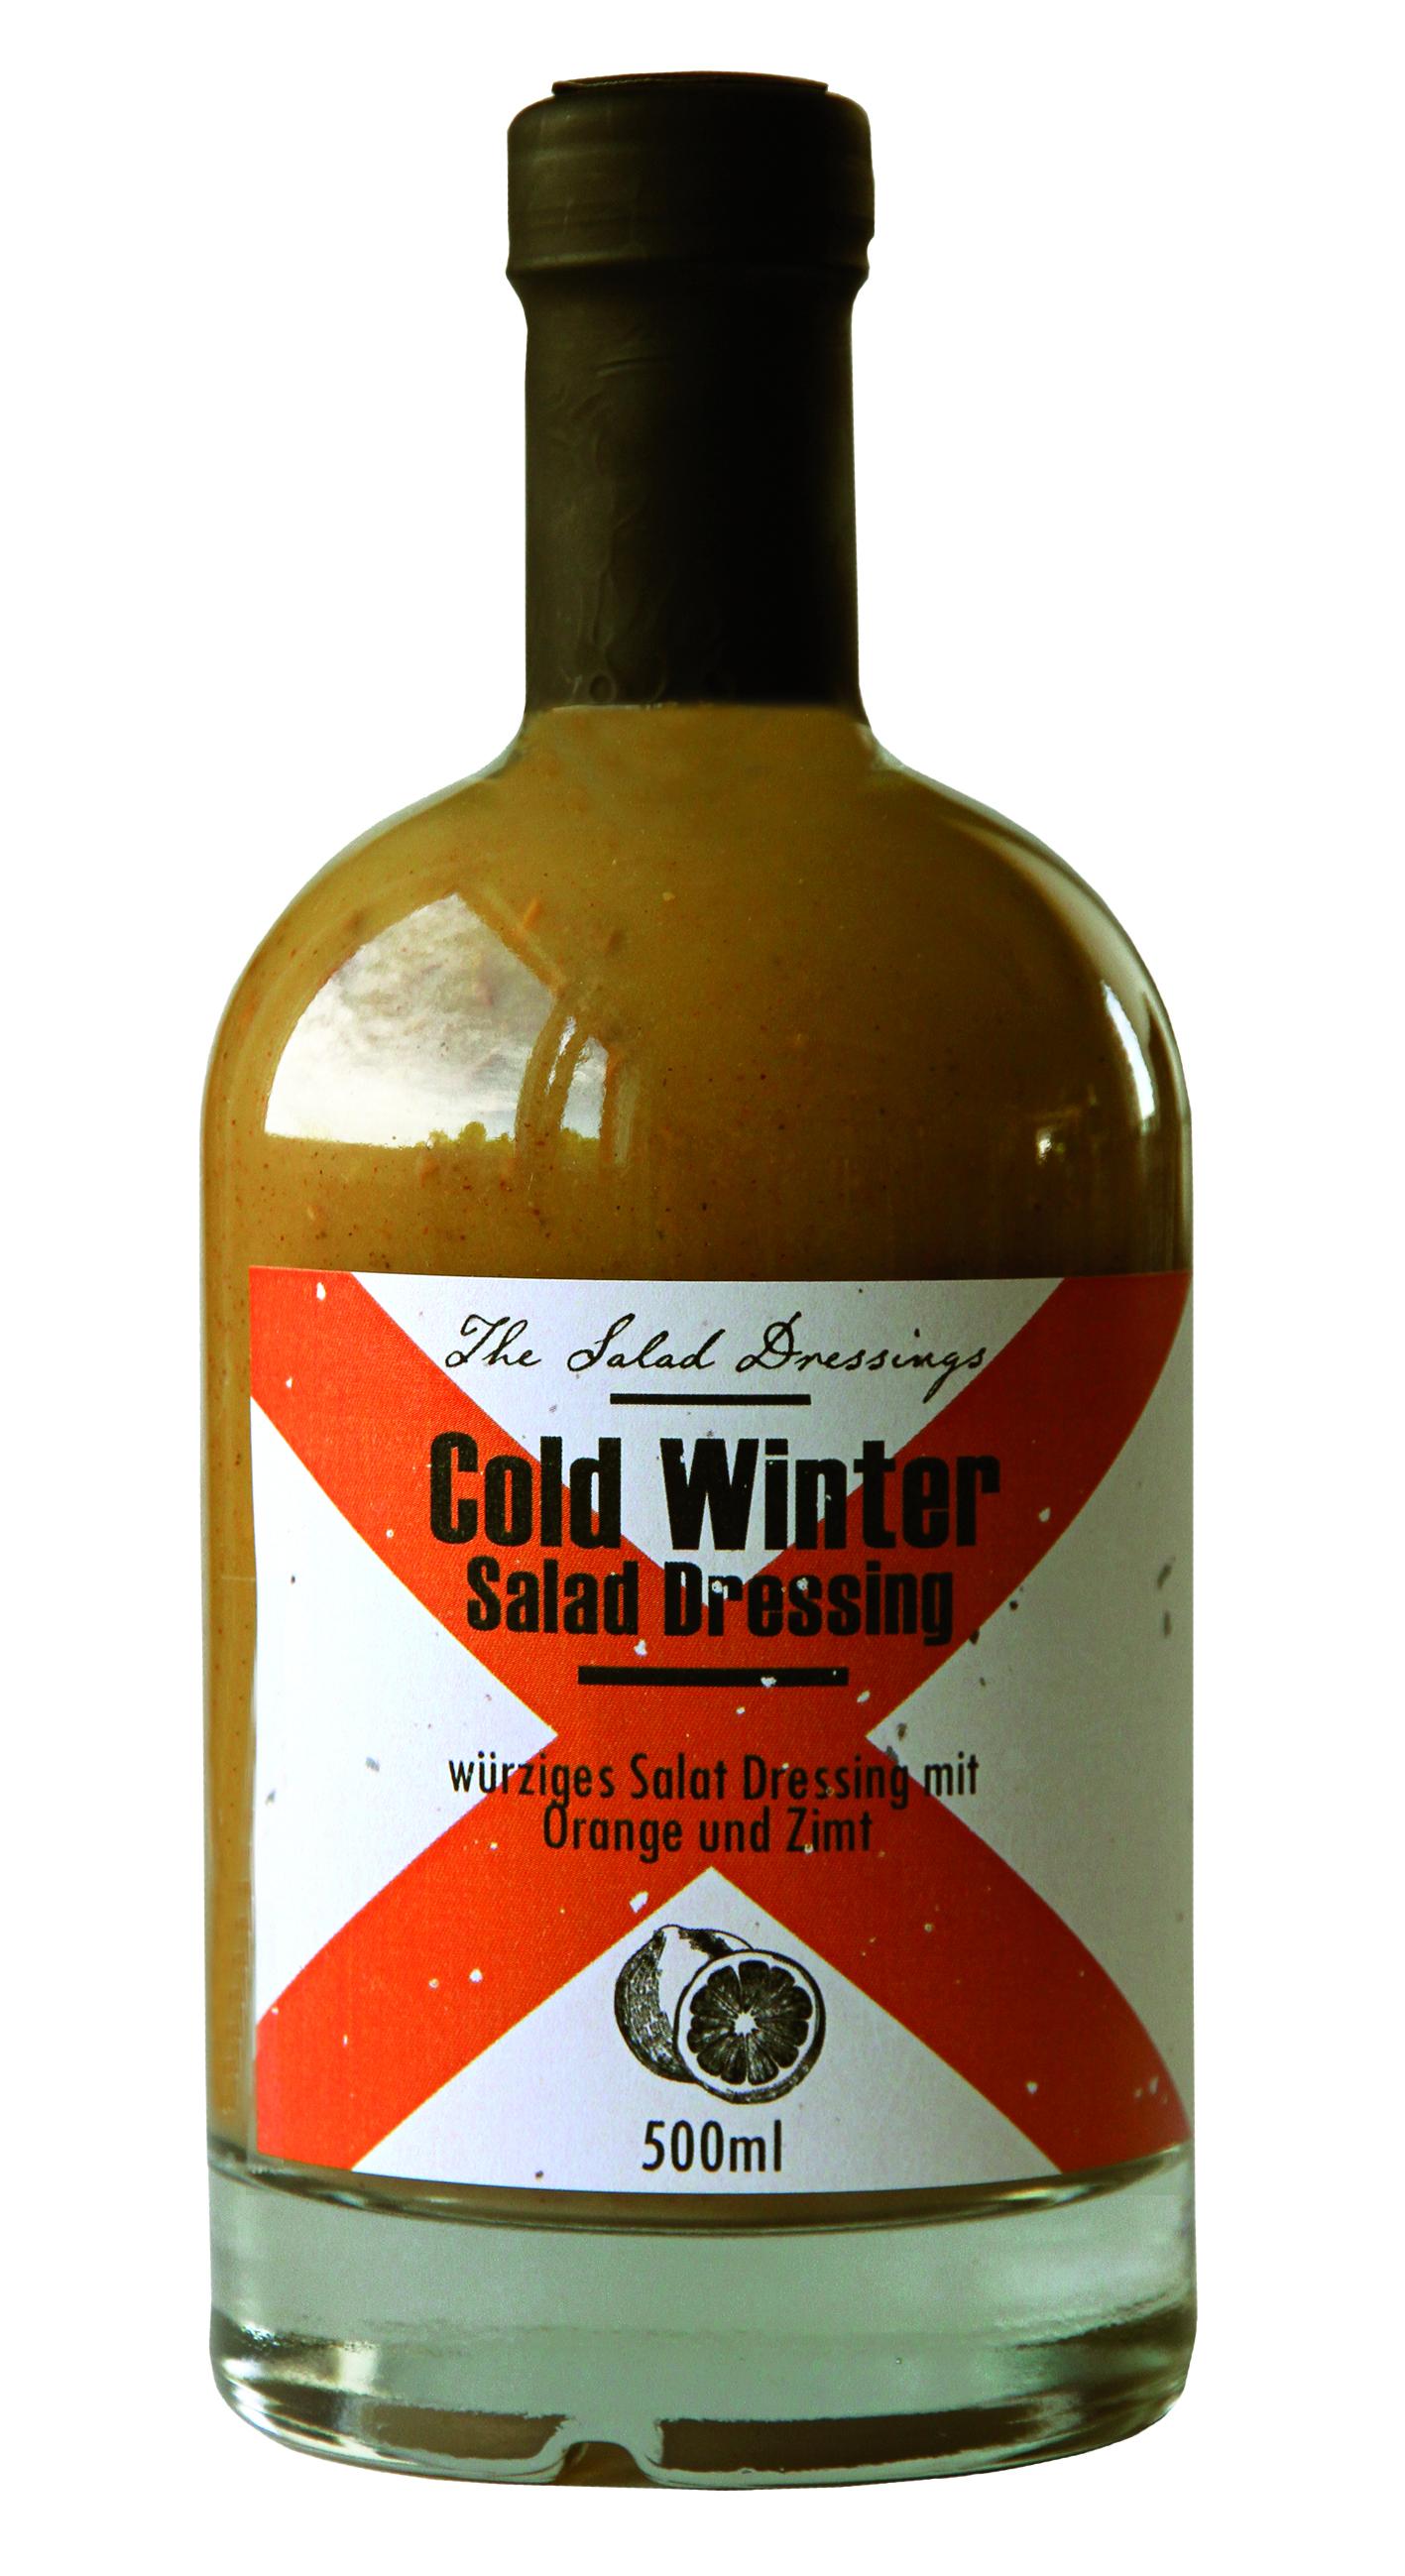 Cold Winter Salad Dressing  500 ml